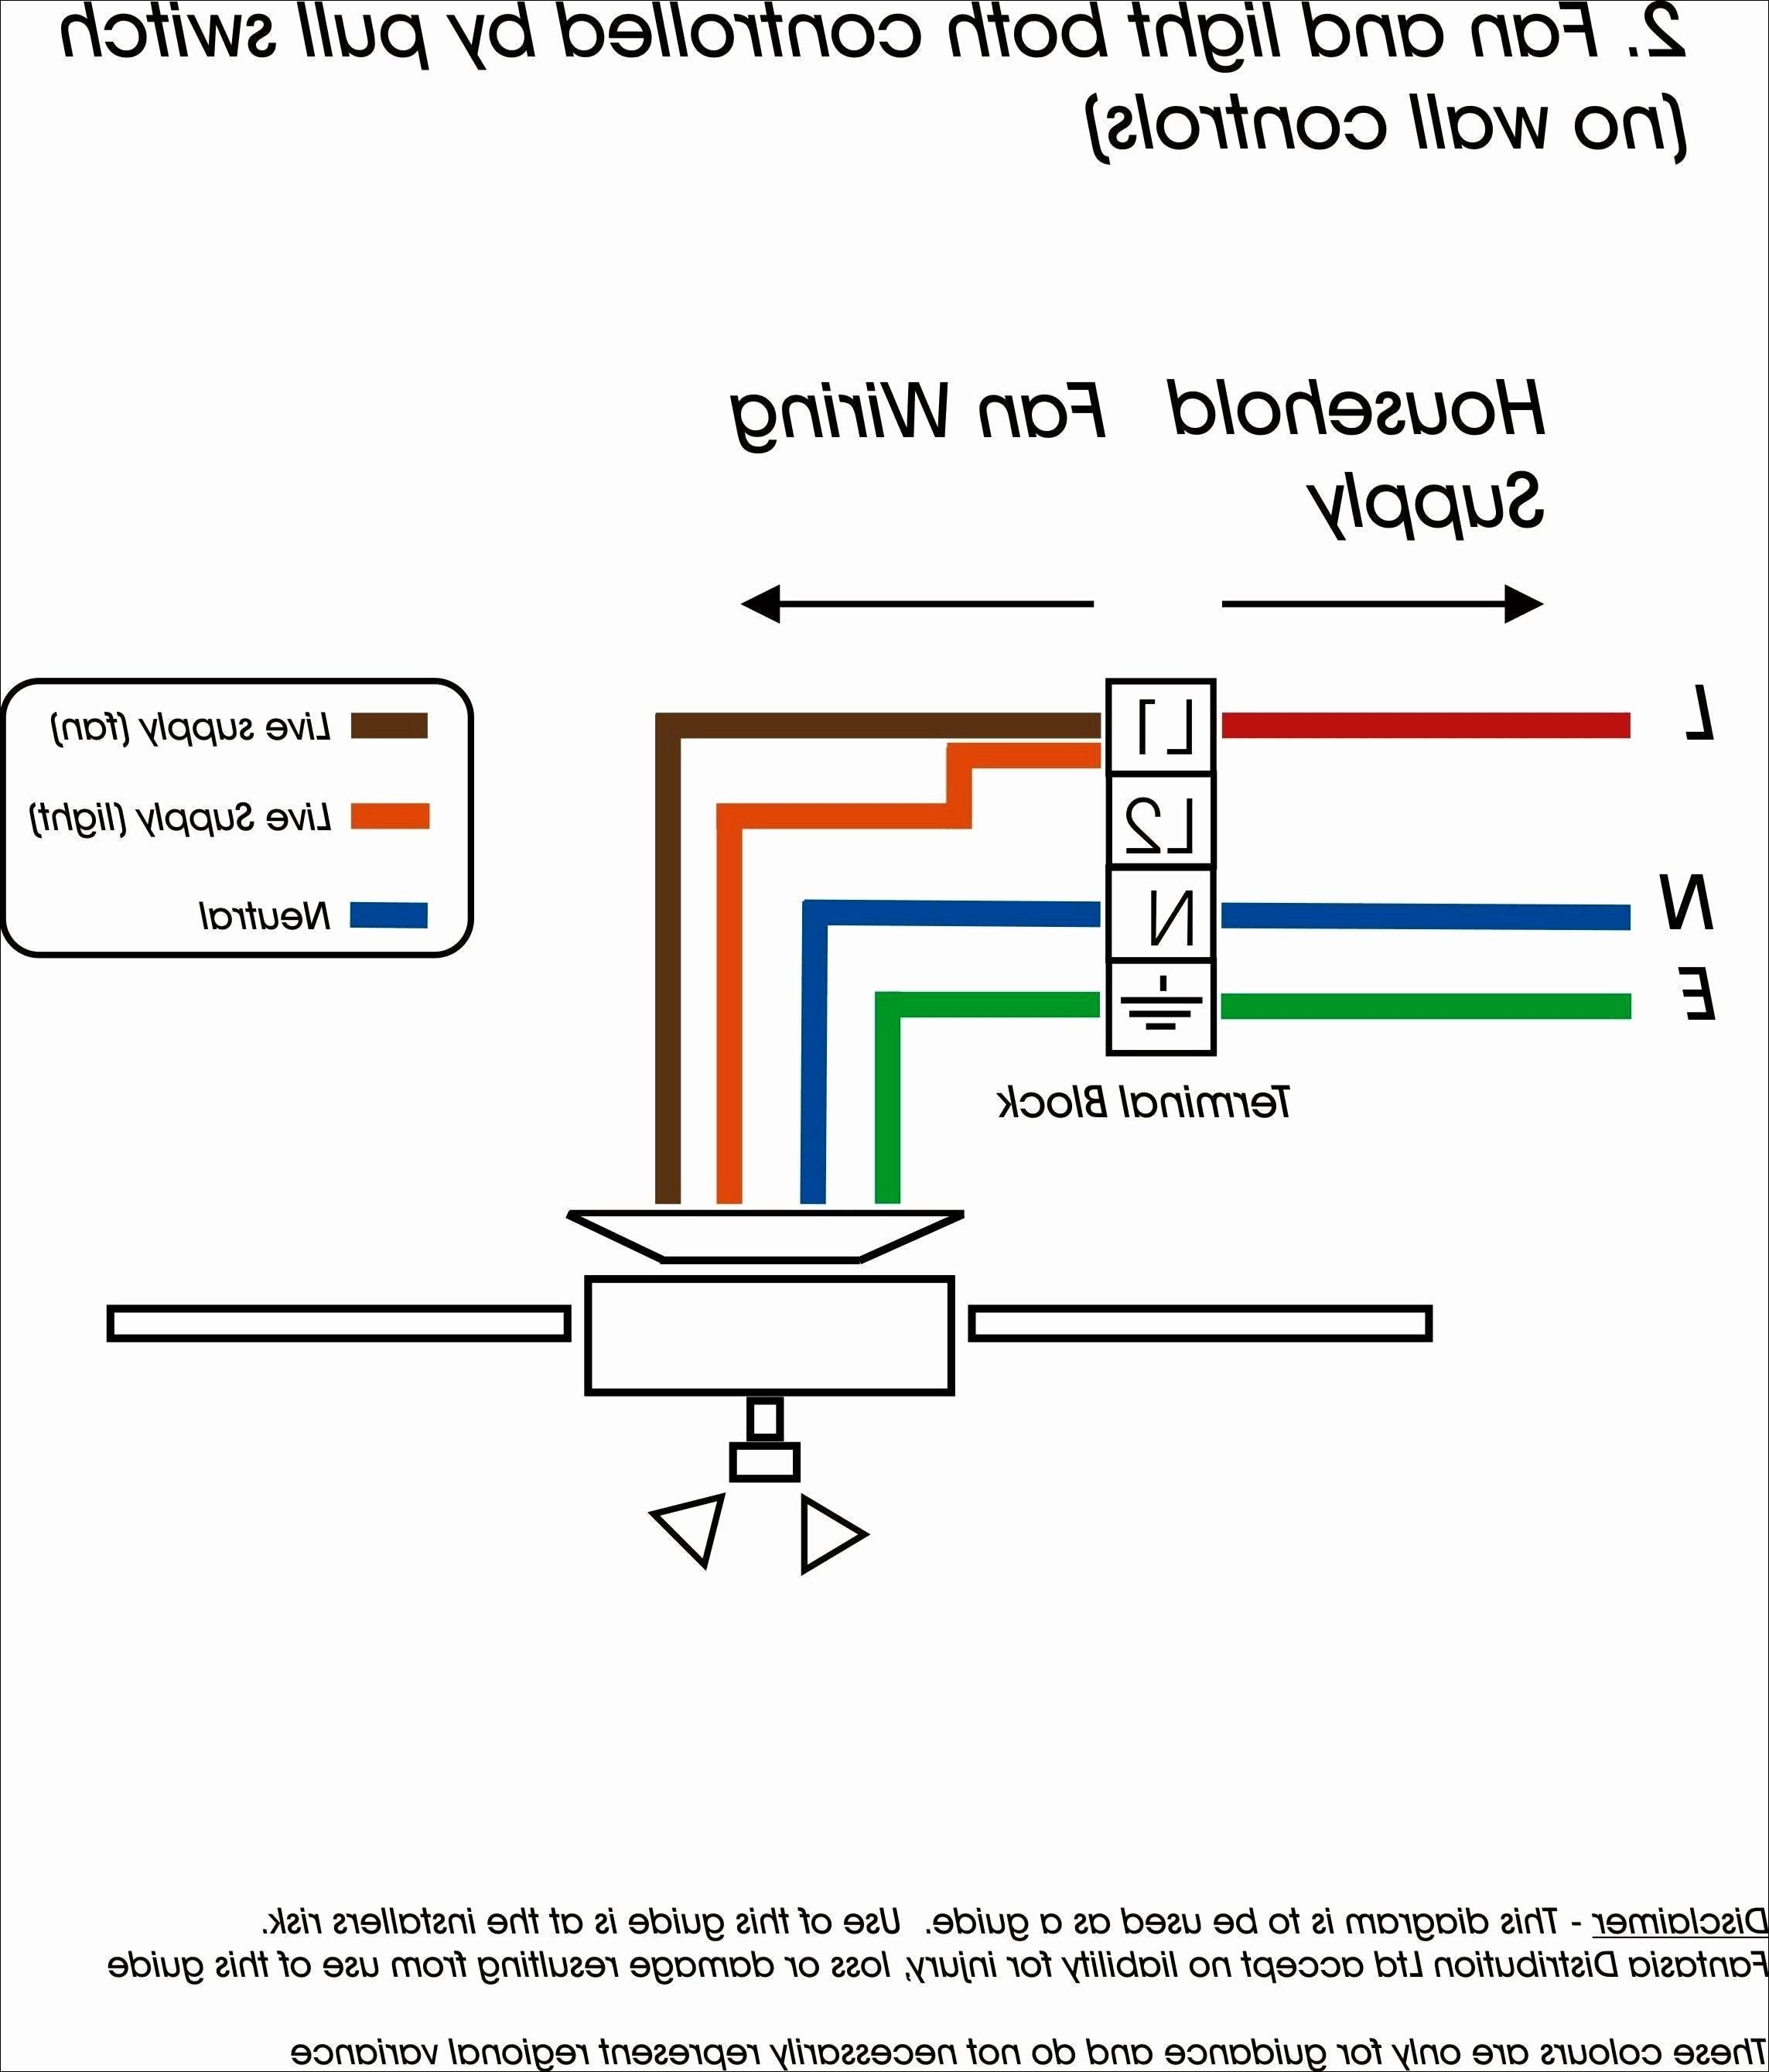 480 volt 1 phase wiring diagram 480 volt 3 phase motor wiring many www vmbso de  480 volt 3 phase motor wiring many